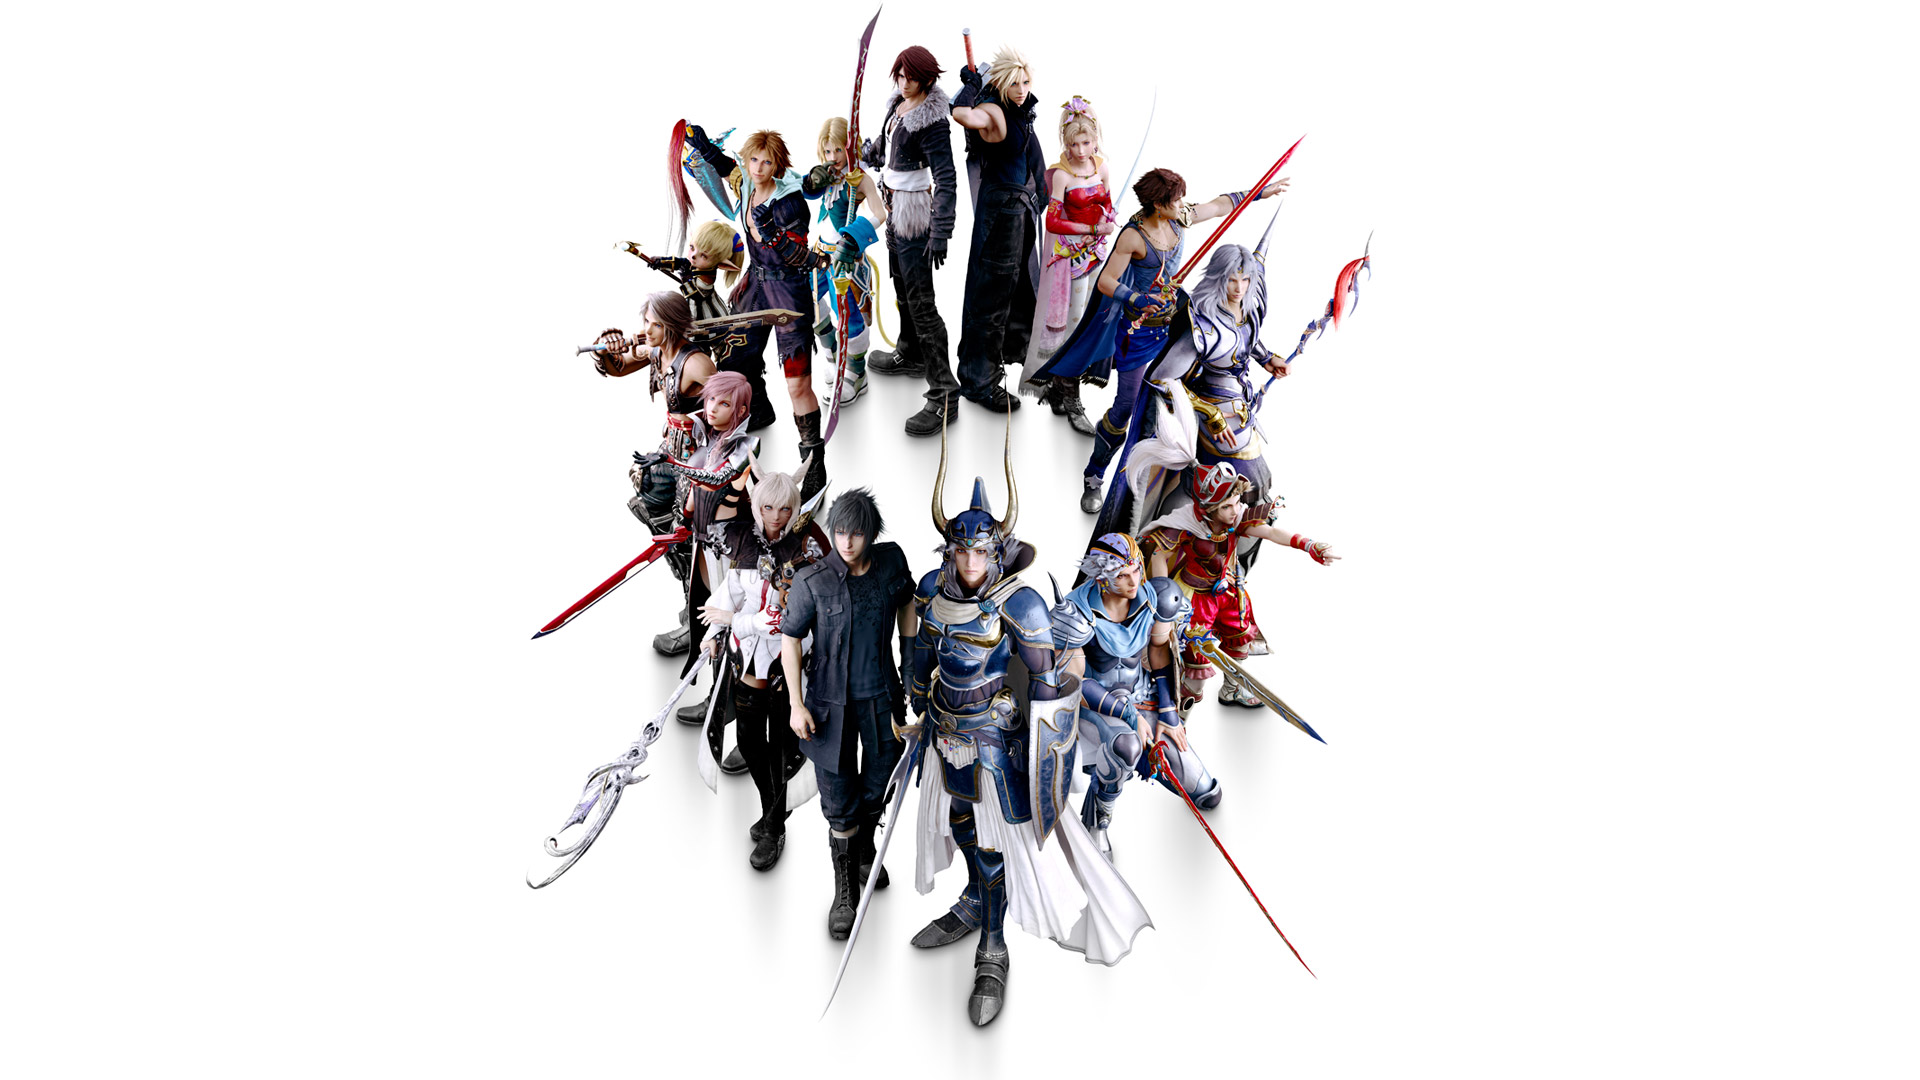 Free Dissidia Final Fantasy NT Wallpaper in 1920x1080